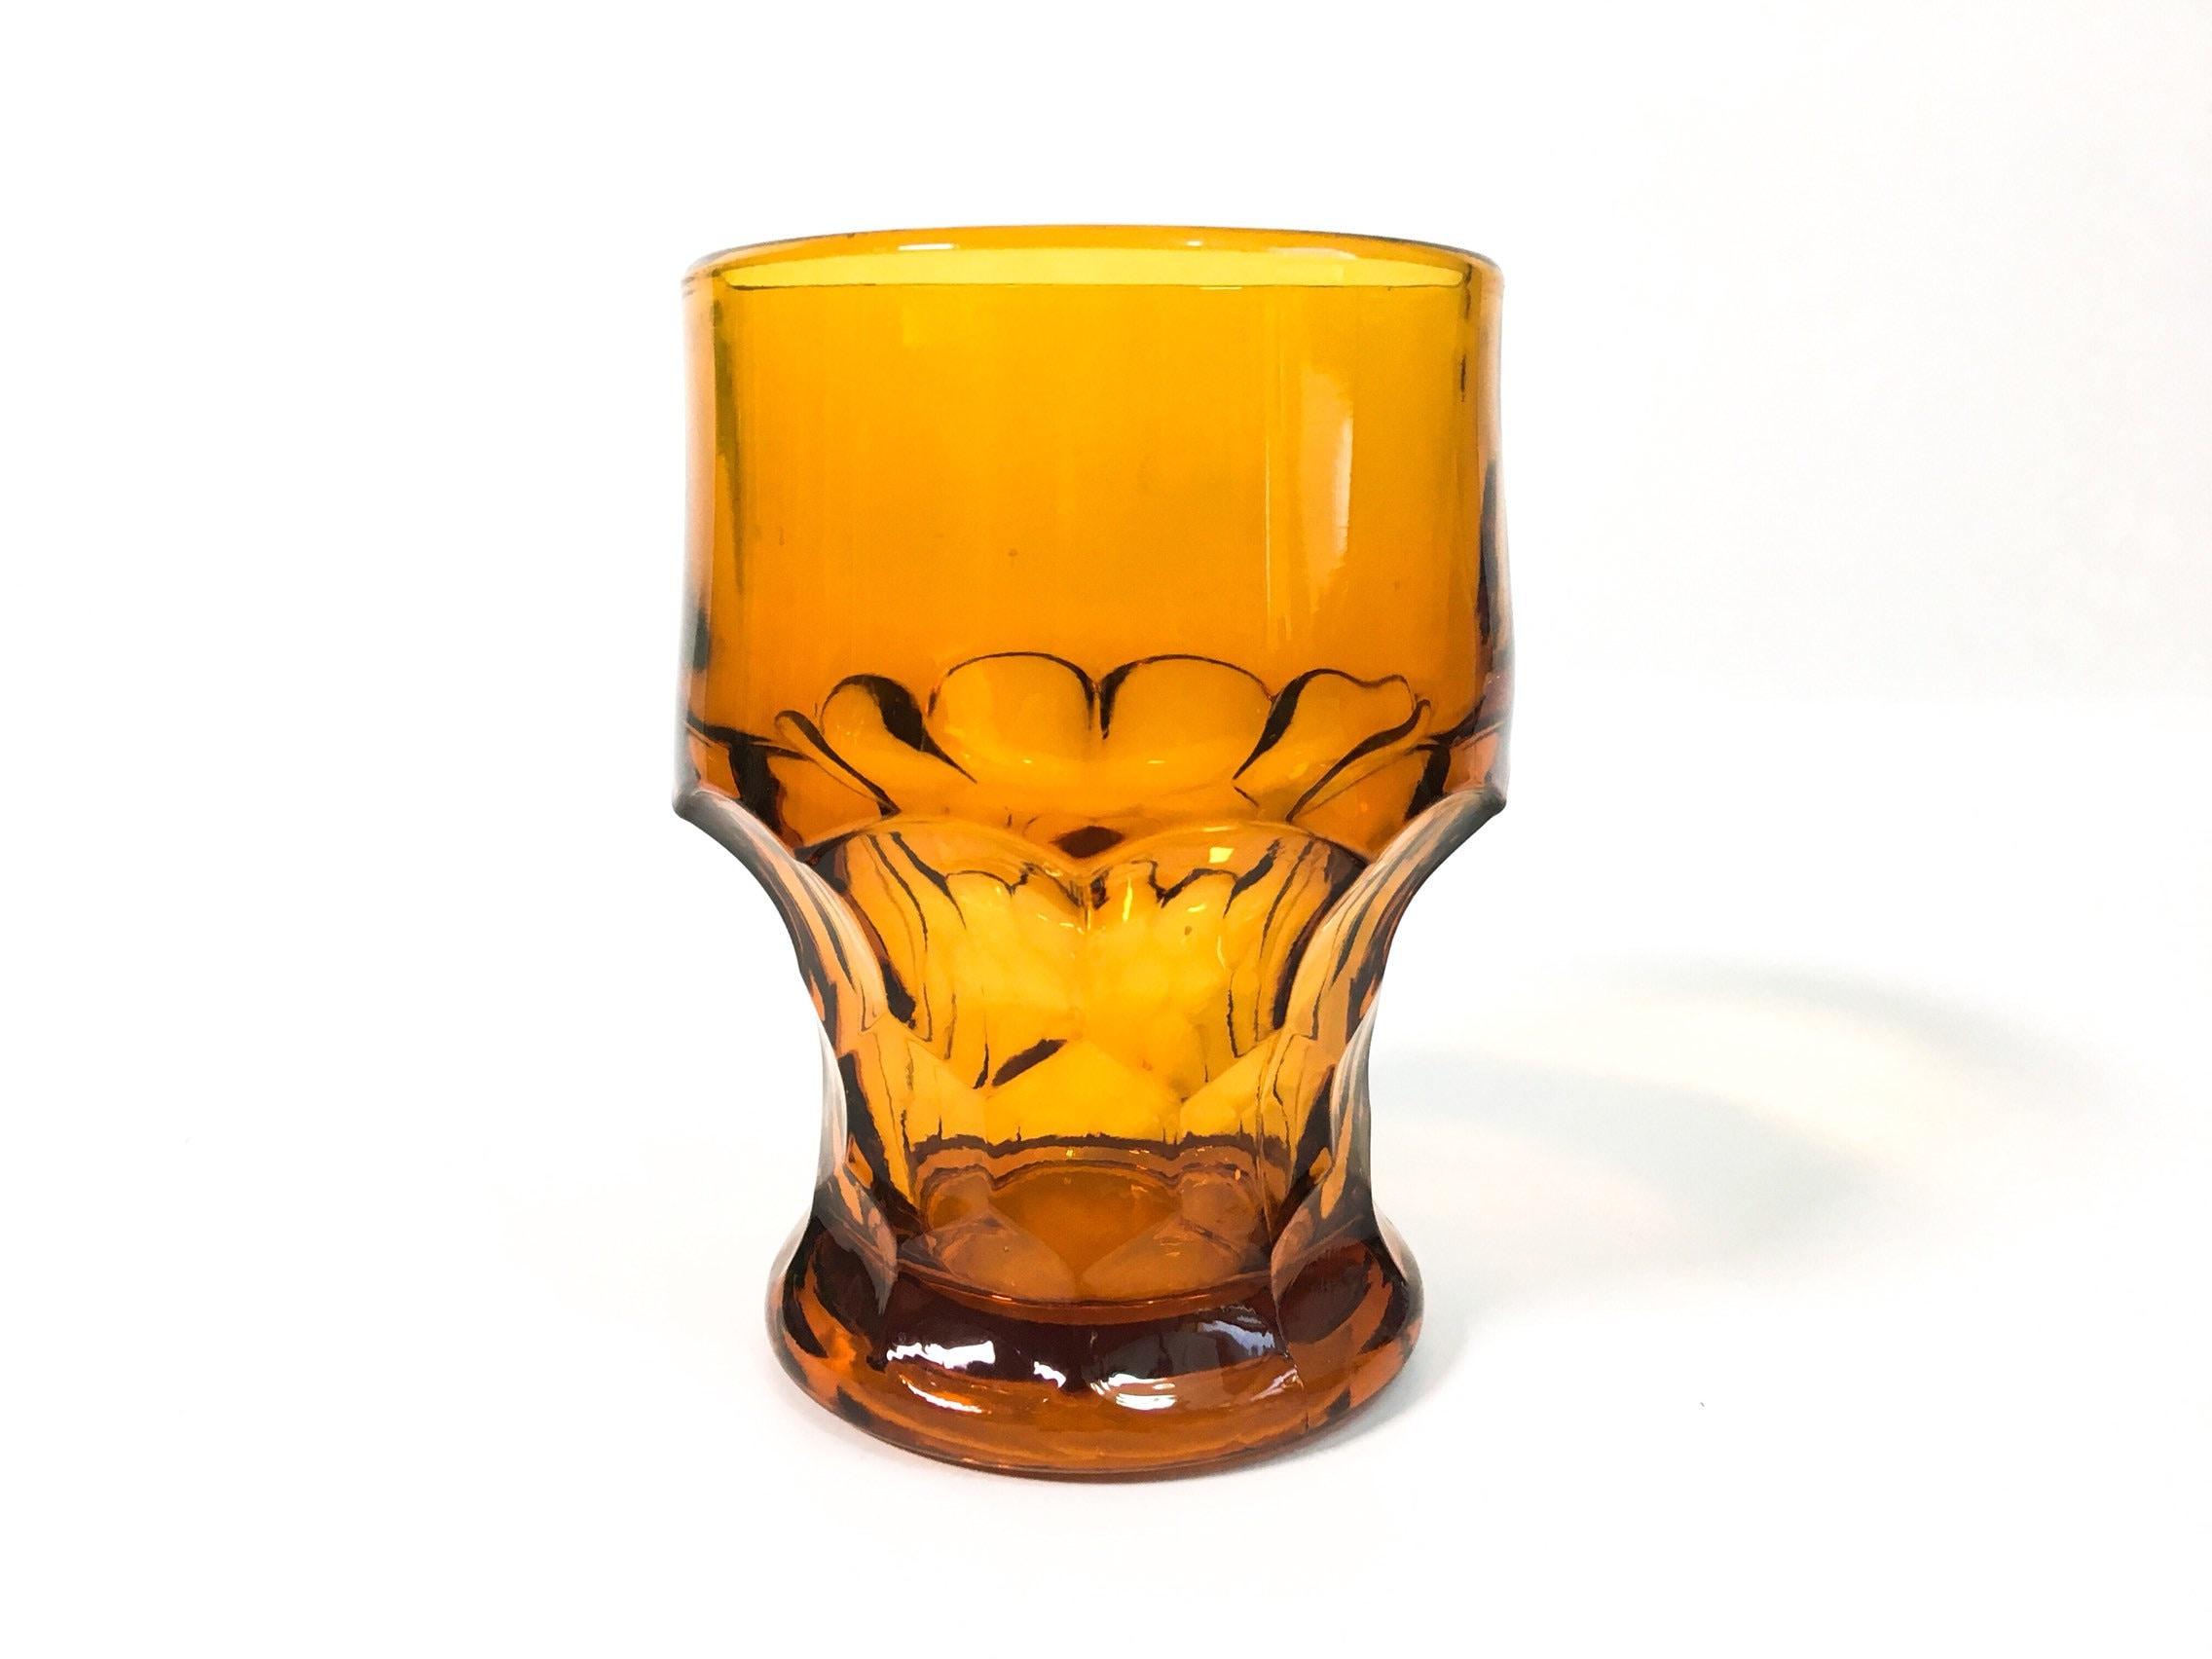 4 Tall Anchor Hocking /'Georgian Topaz Amber /' Salt Shaker